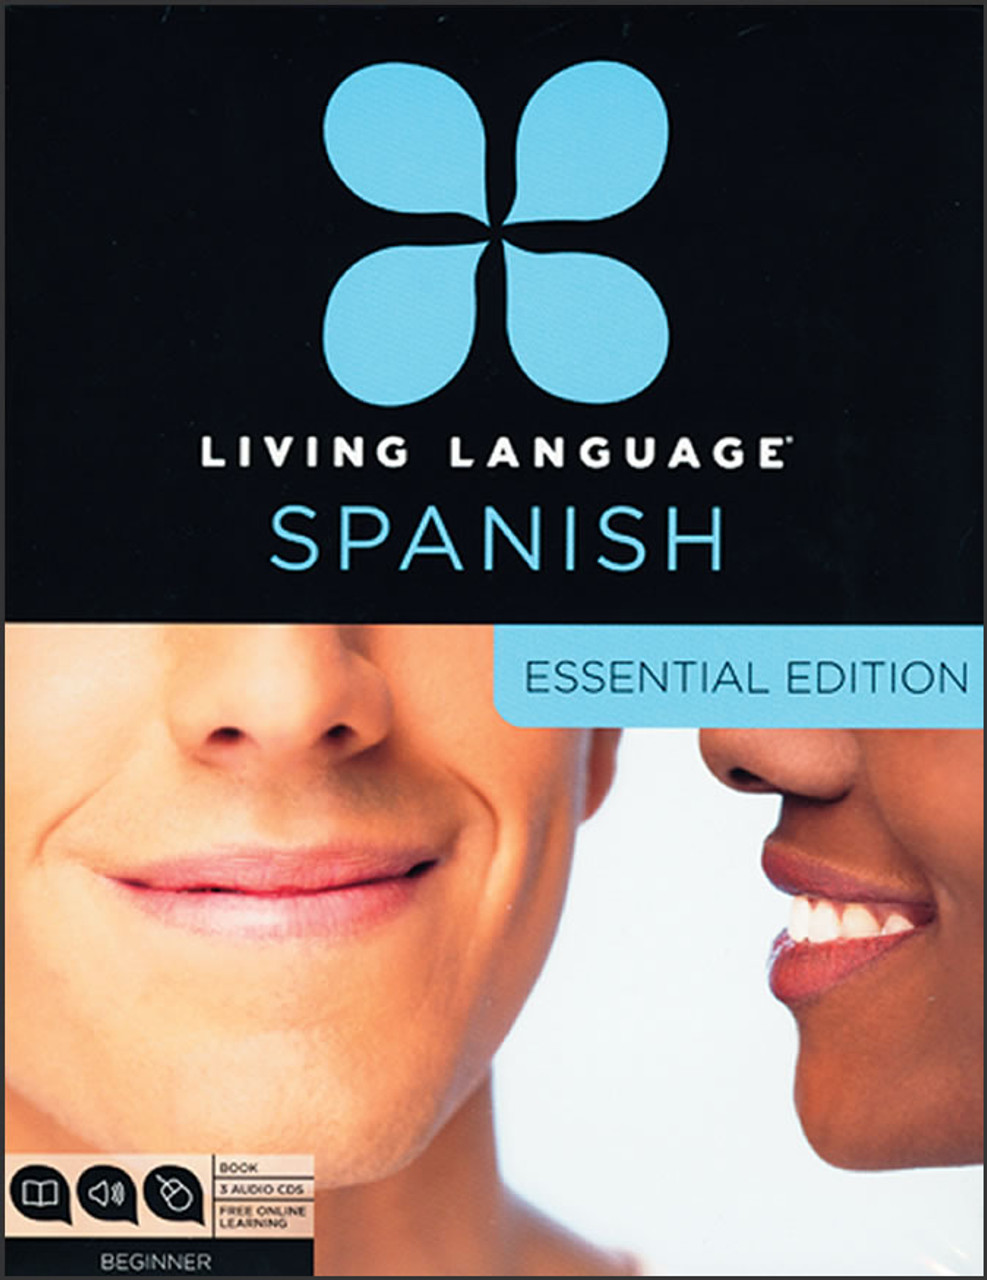 Living Language Spanish: Essential Edition